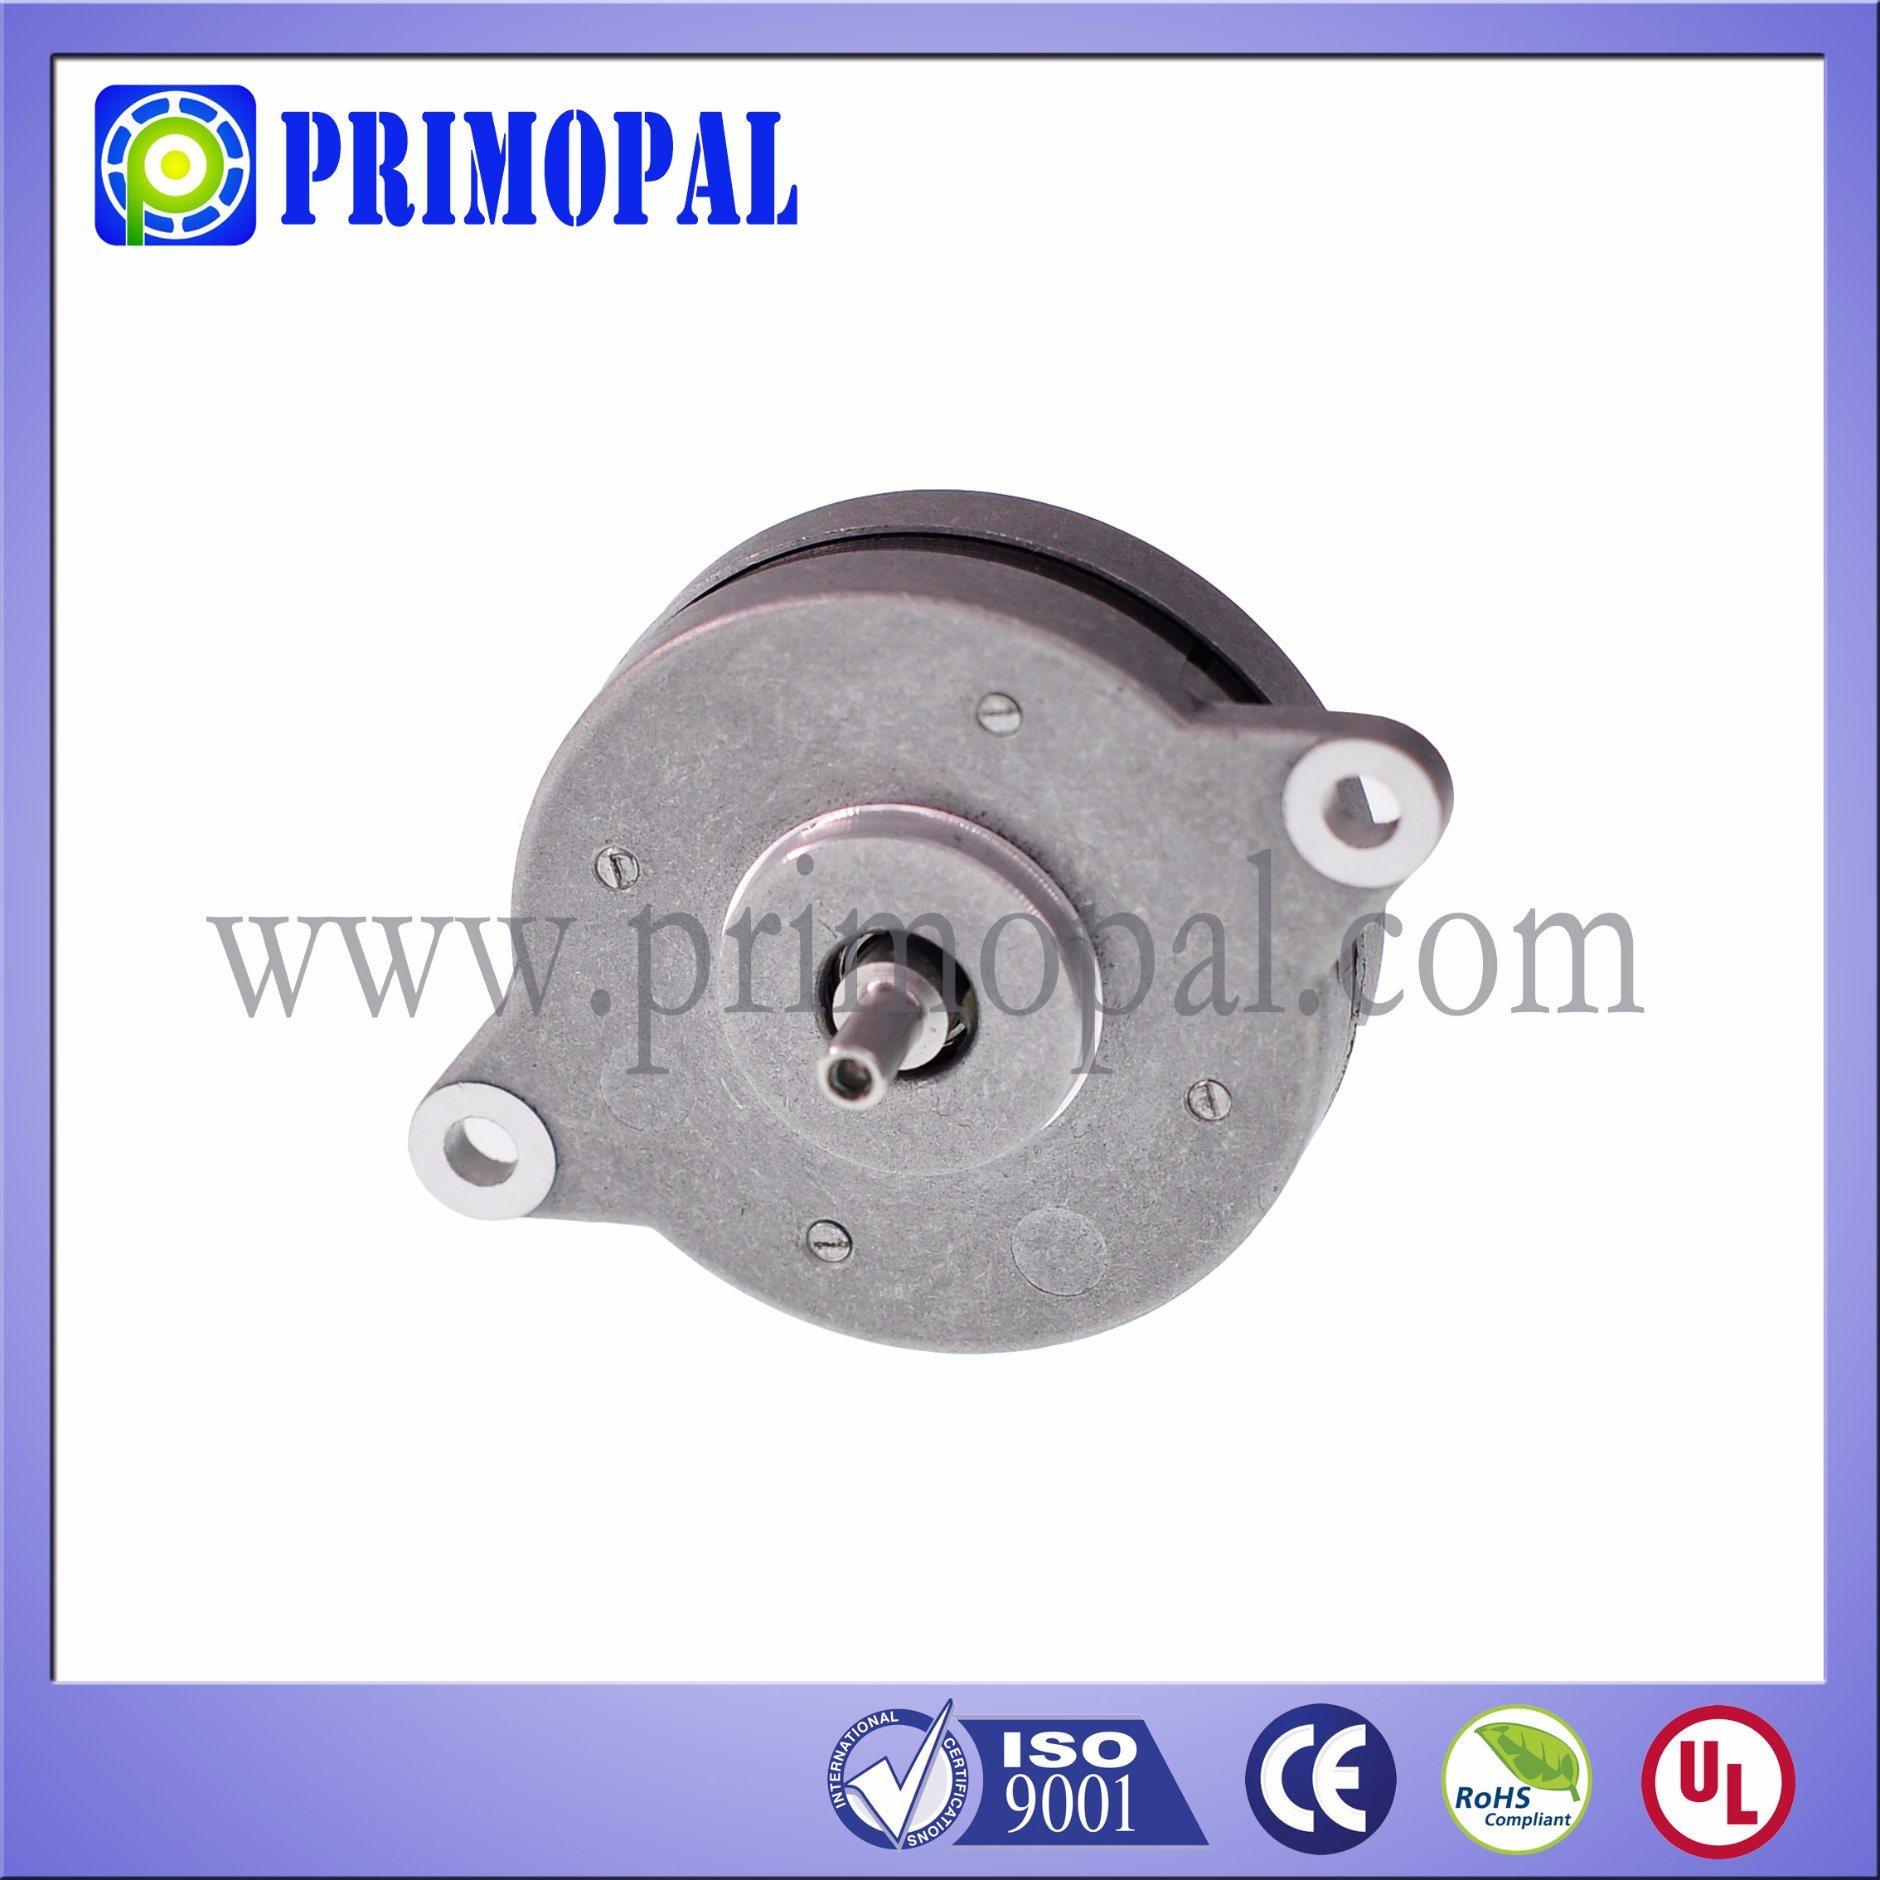 0.9 Step Angle NEMA 14 Round Micro Stepper Motor